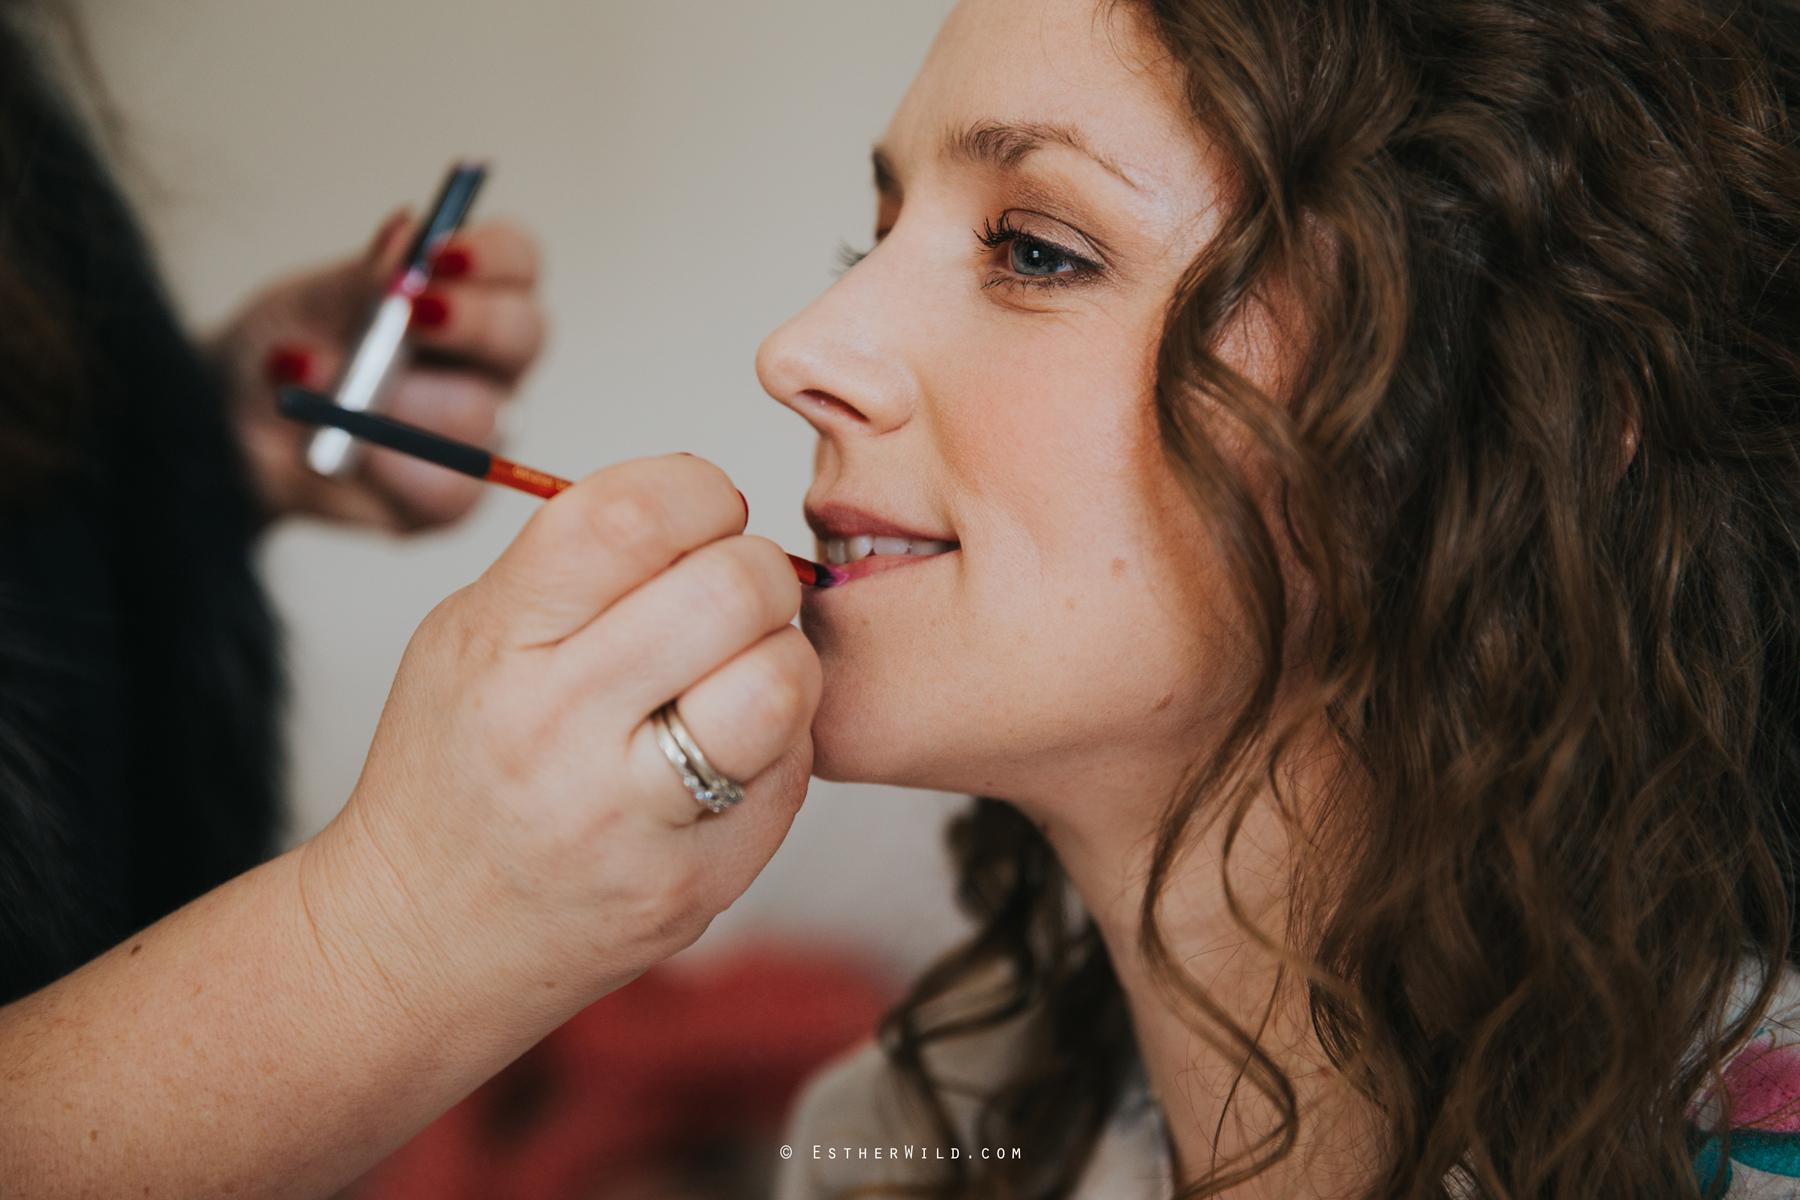 The_BoatHouse_Wedding_Venue_Ormesby_Norfolk_Broads_Boat_Wedding_Photography_Esther_Wild_Photographer_IMG_0344.jpg